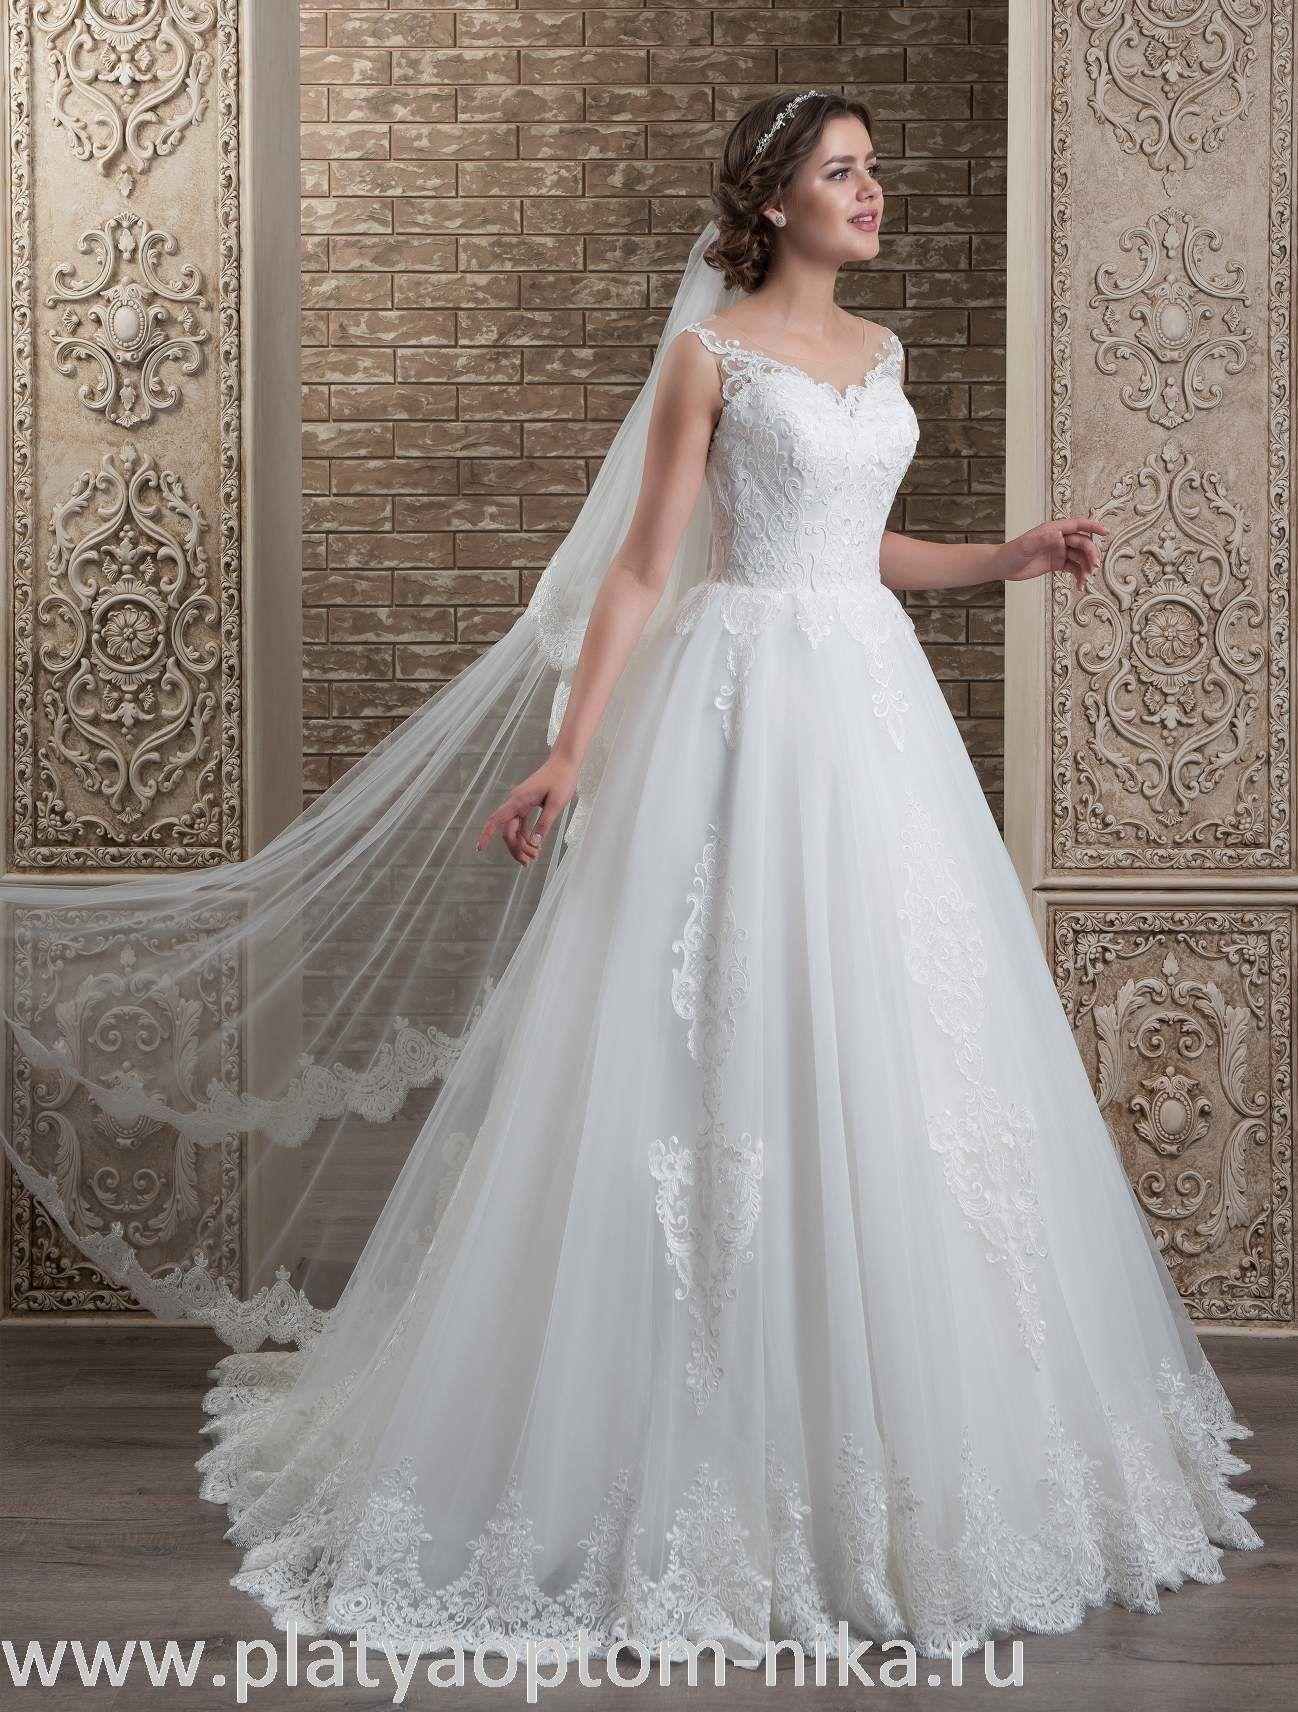 Buy Wedding Dress. Price, photos, reviews -> Collection \